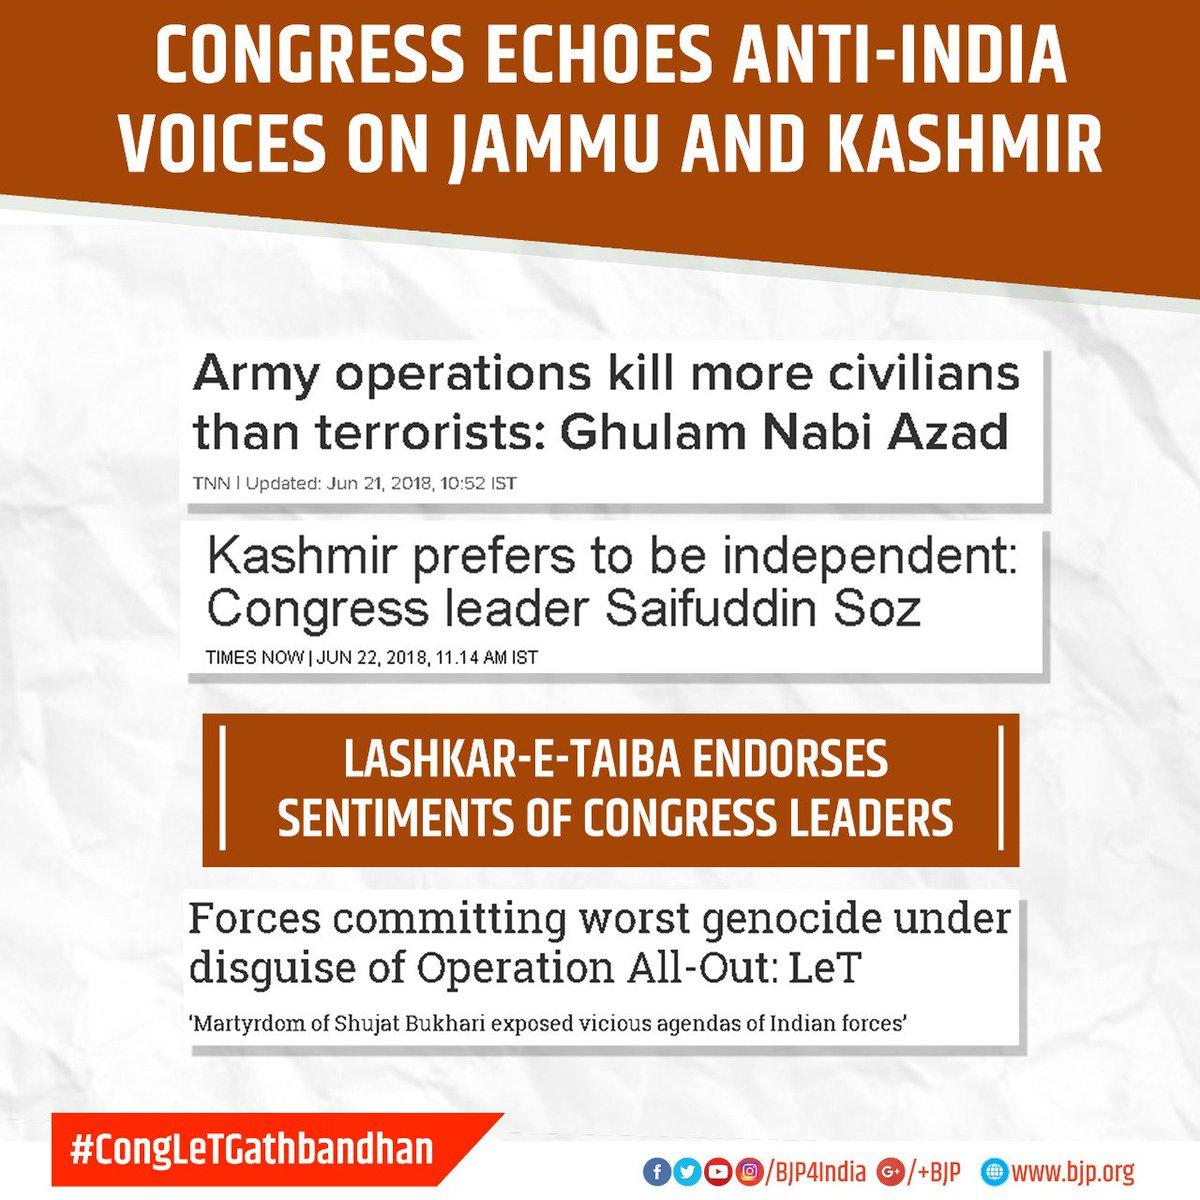 Congress leaders undermine India's sovereignty. #CongLeTGathbandhan